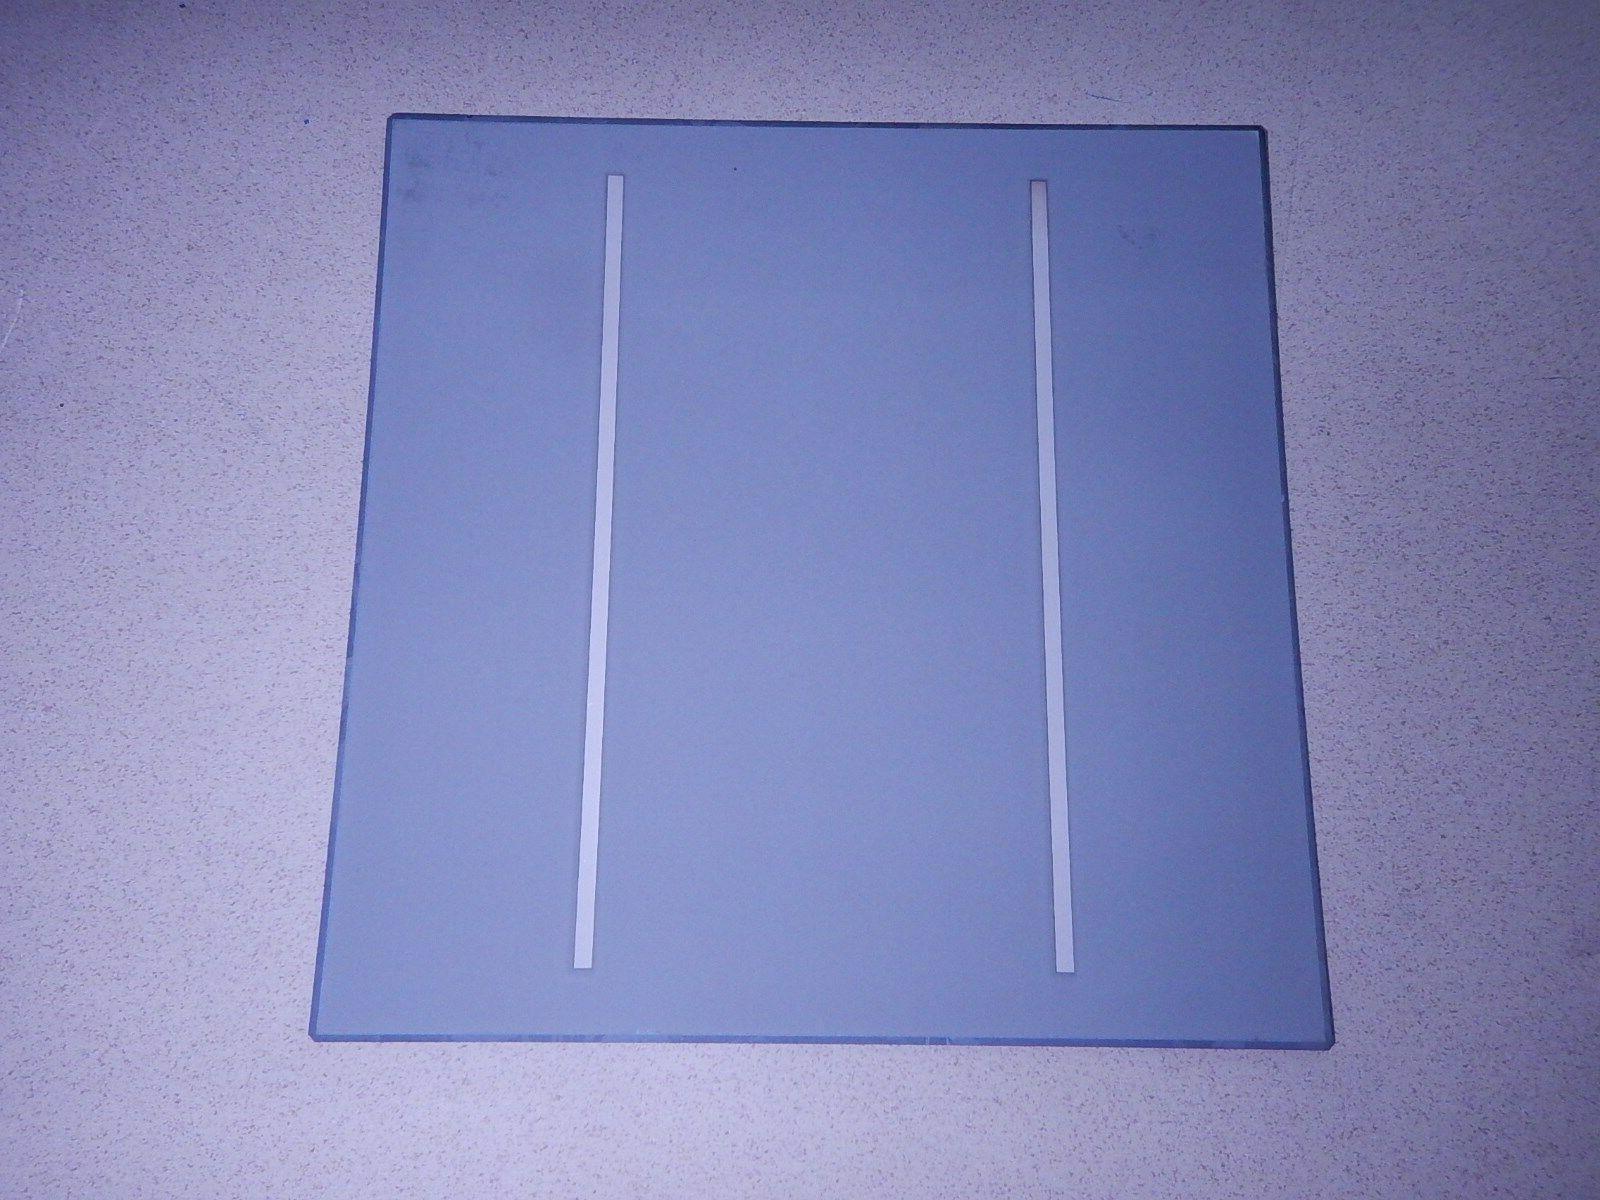 solar kit-diy panels,jbx,flux pen,T+B wire